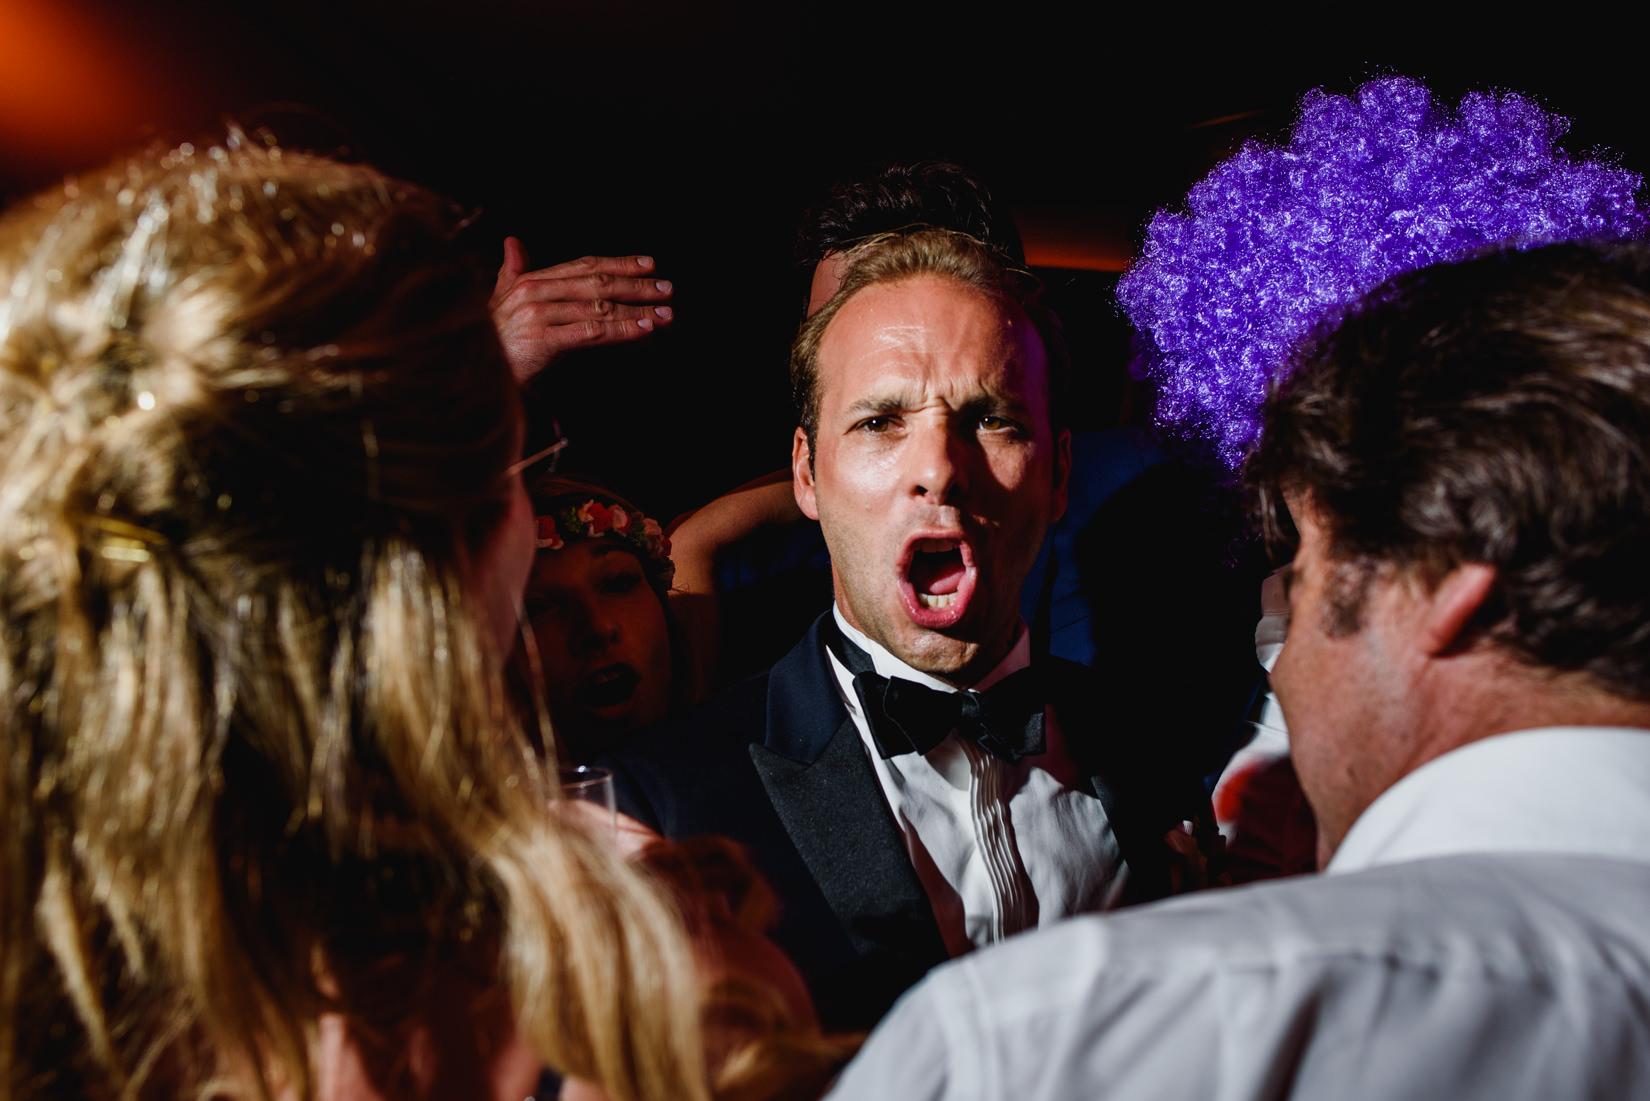 wedding-la-escollera-84.jpg